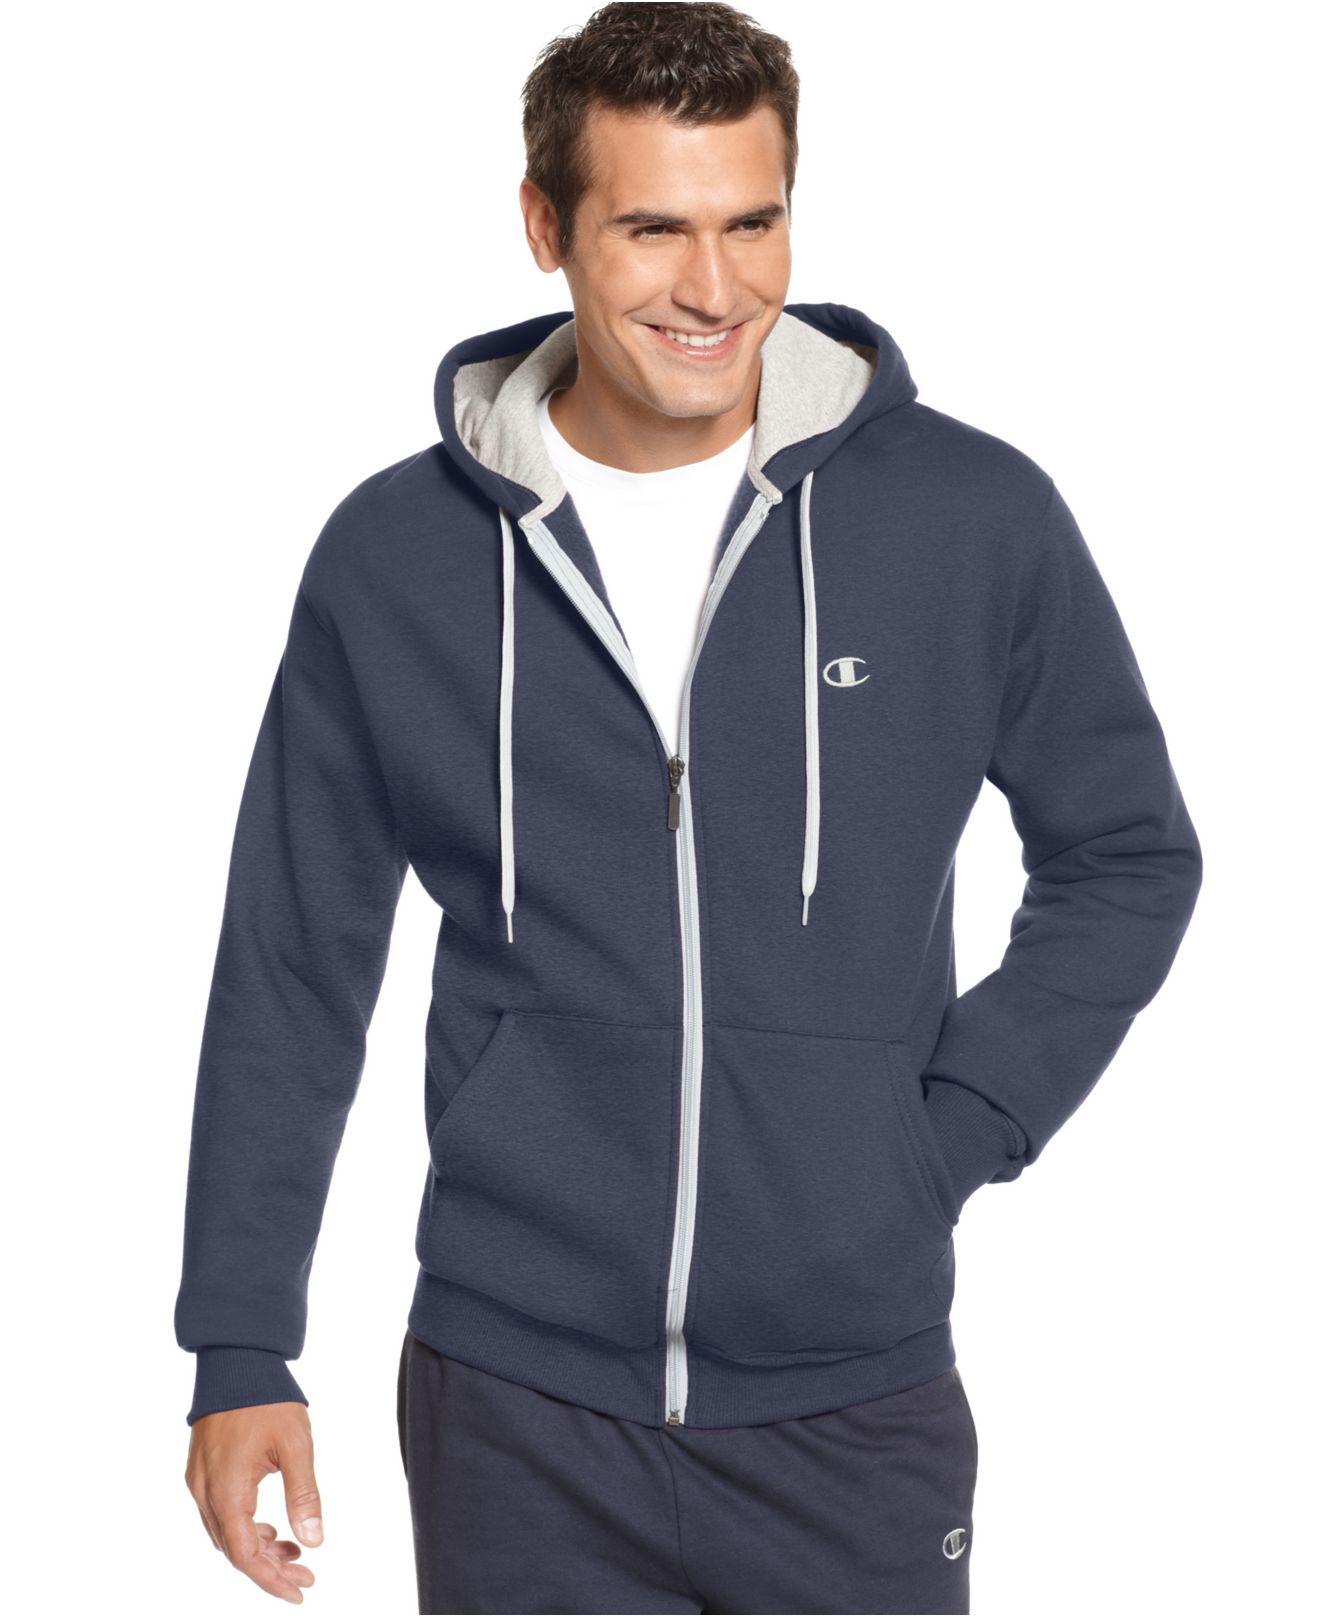 Mens champion hoodies